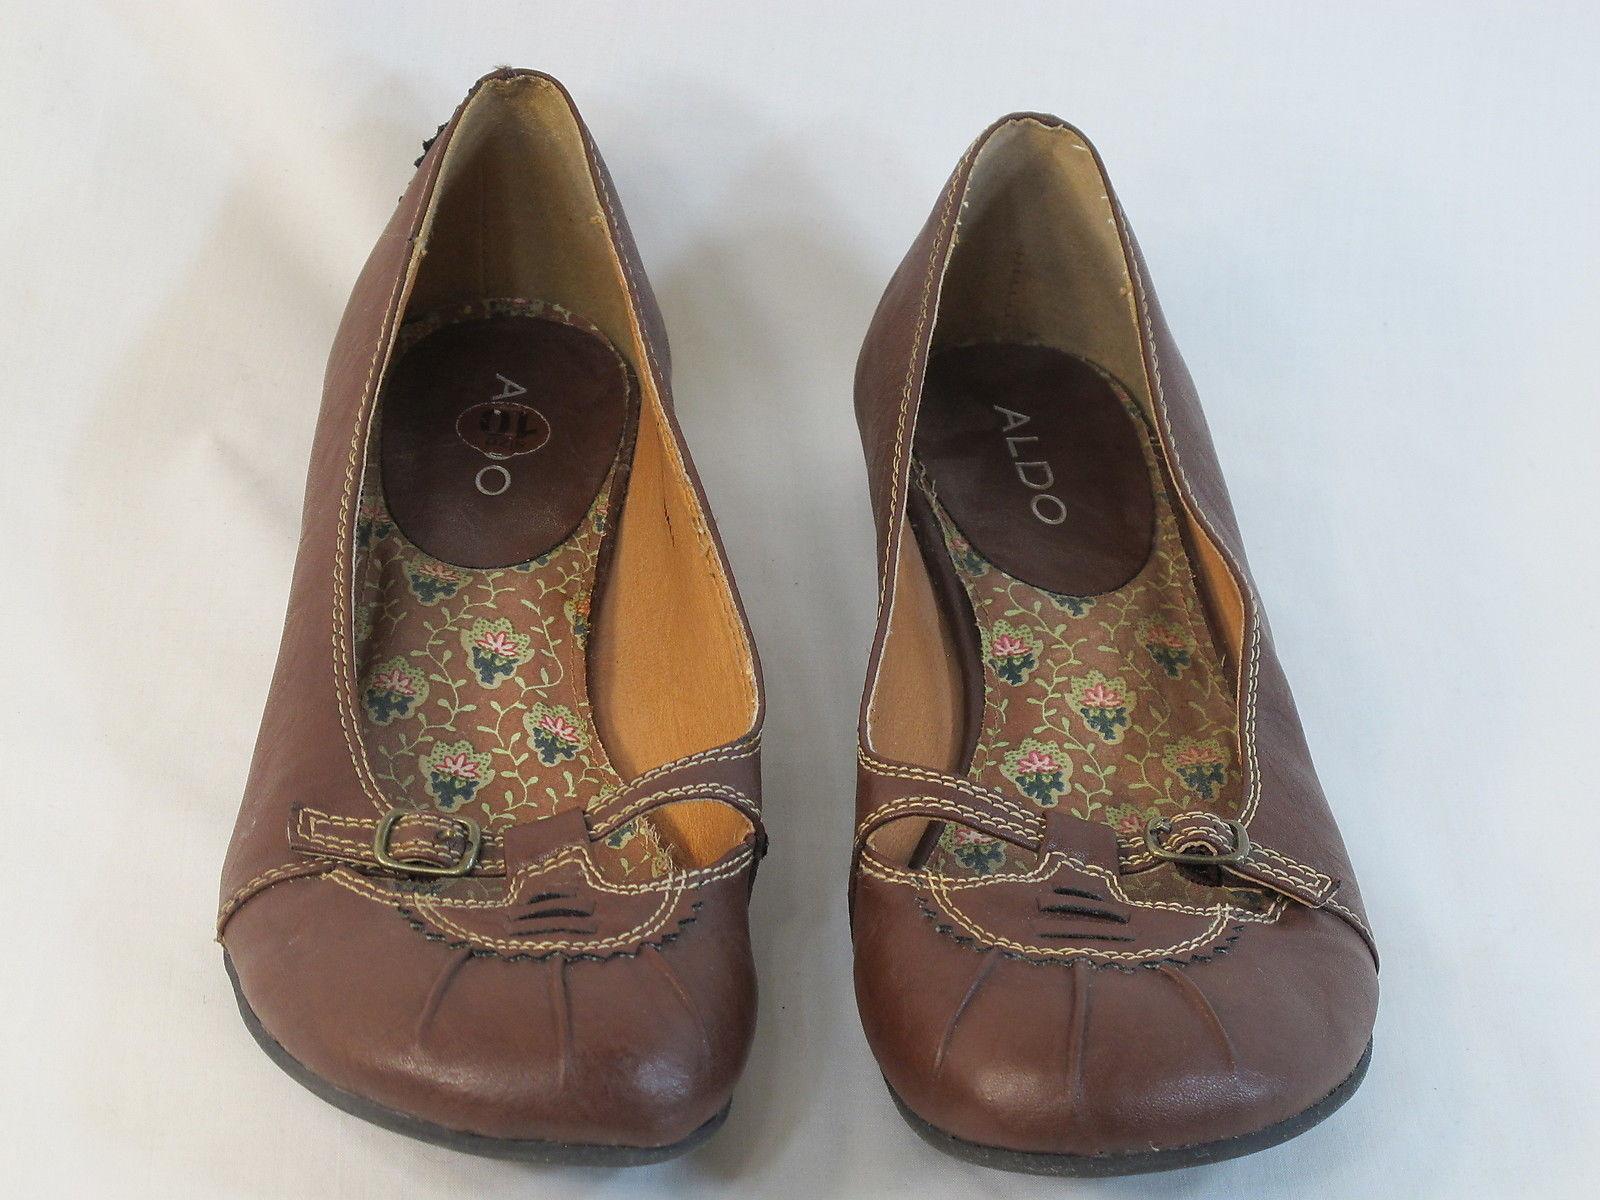 ALDO Brown Loafer Flats 9 M US Excellent Condition EUR 40